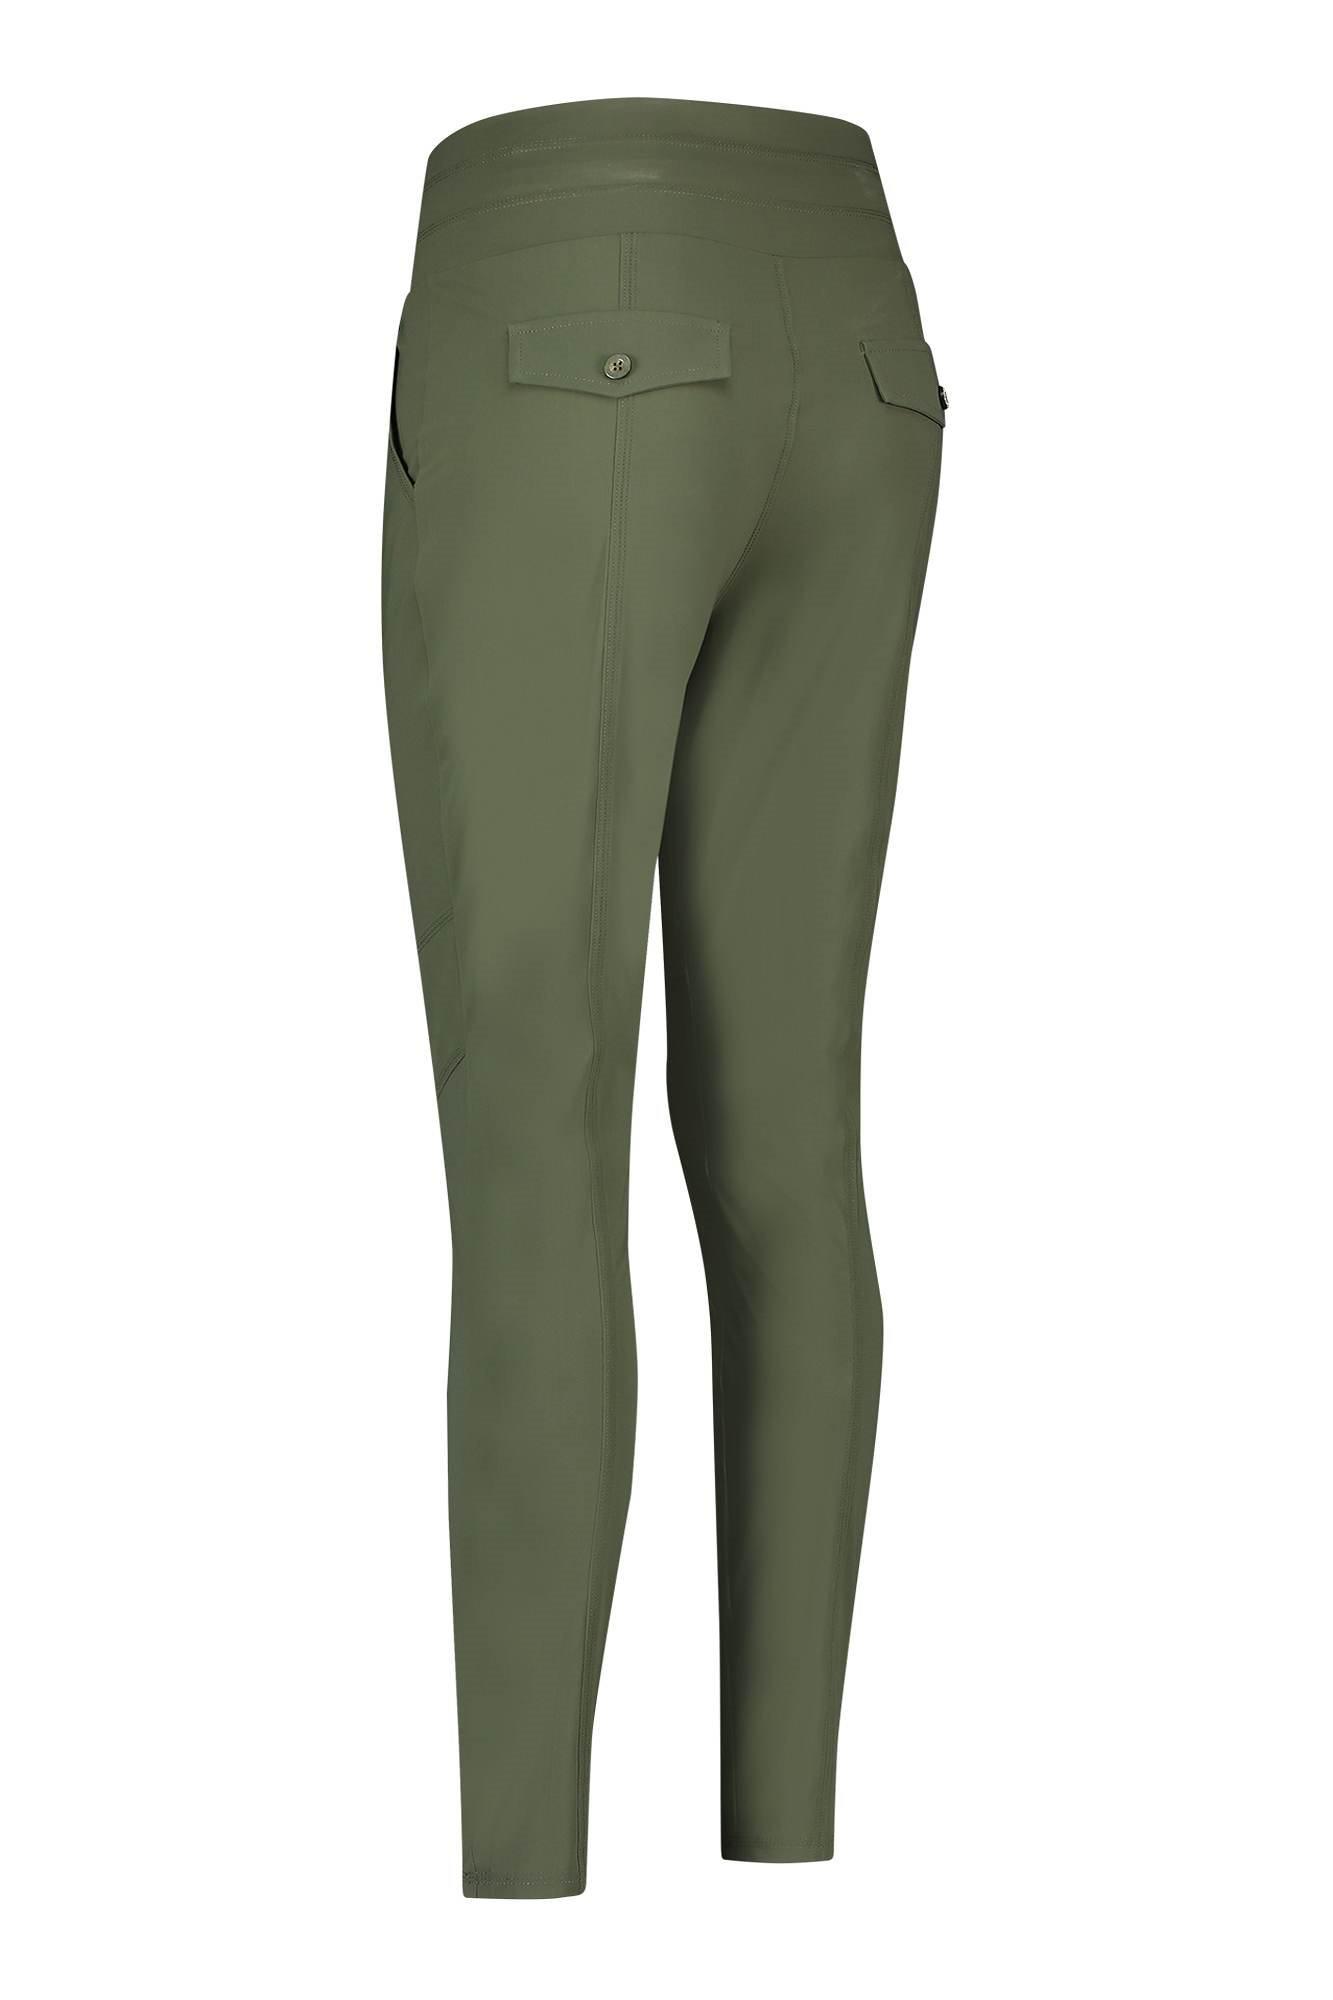 New Franka trousers army